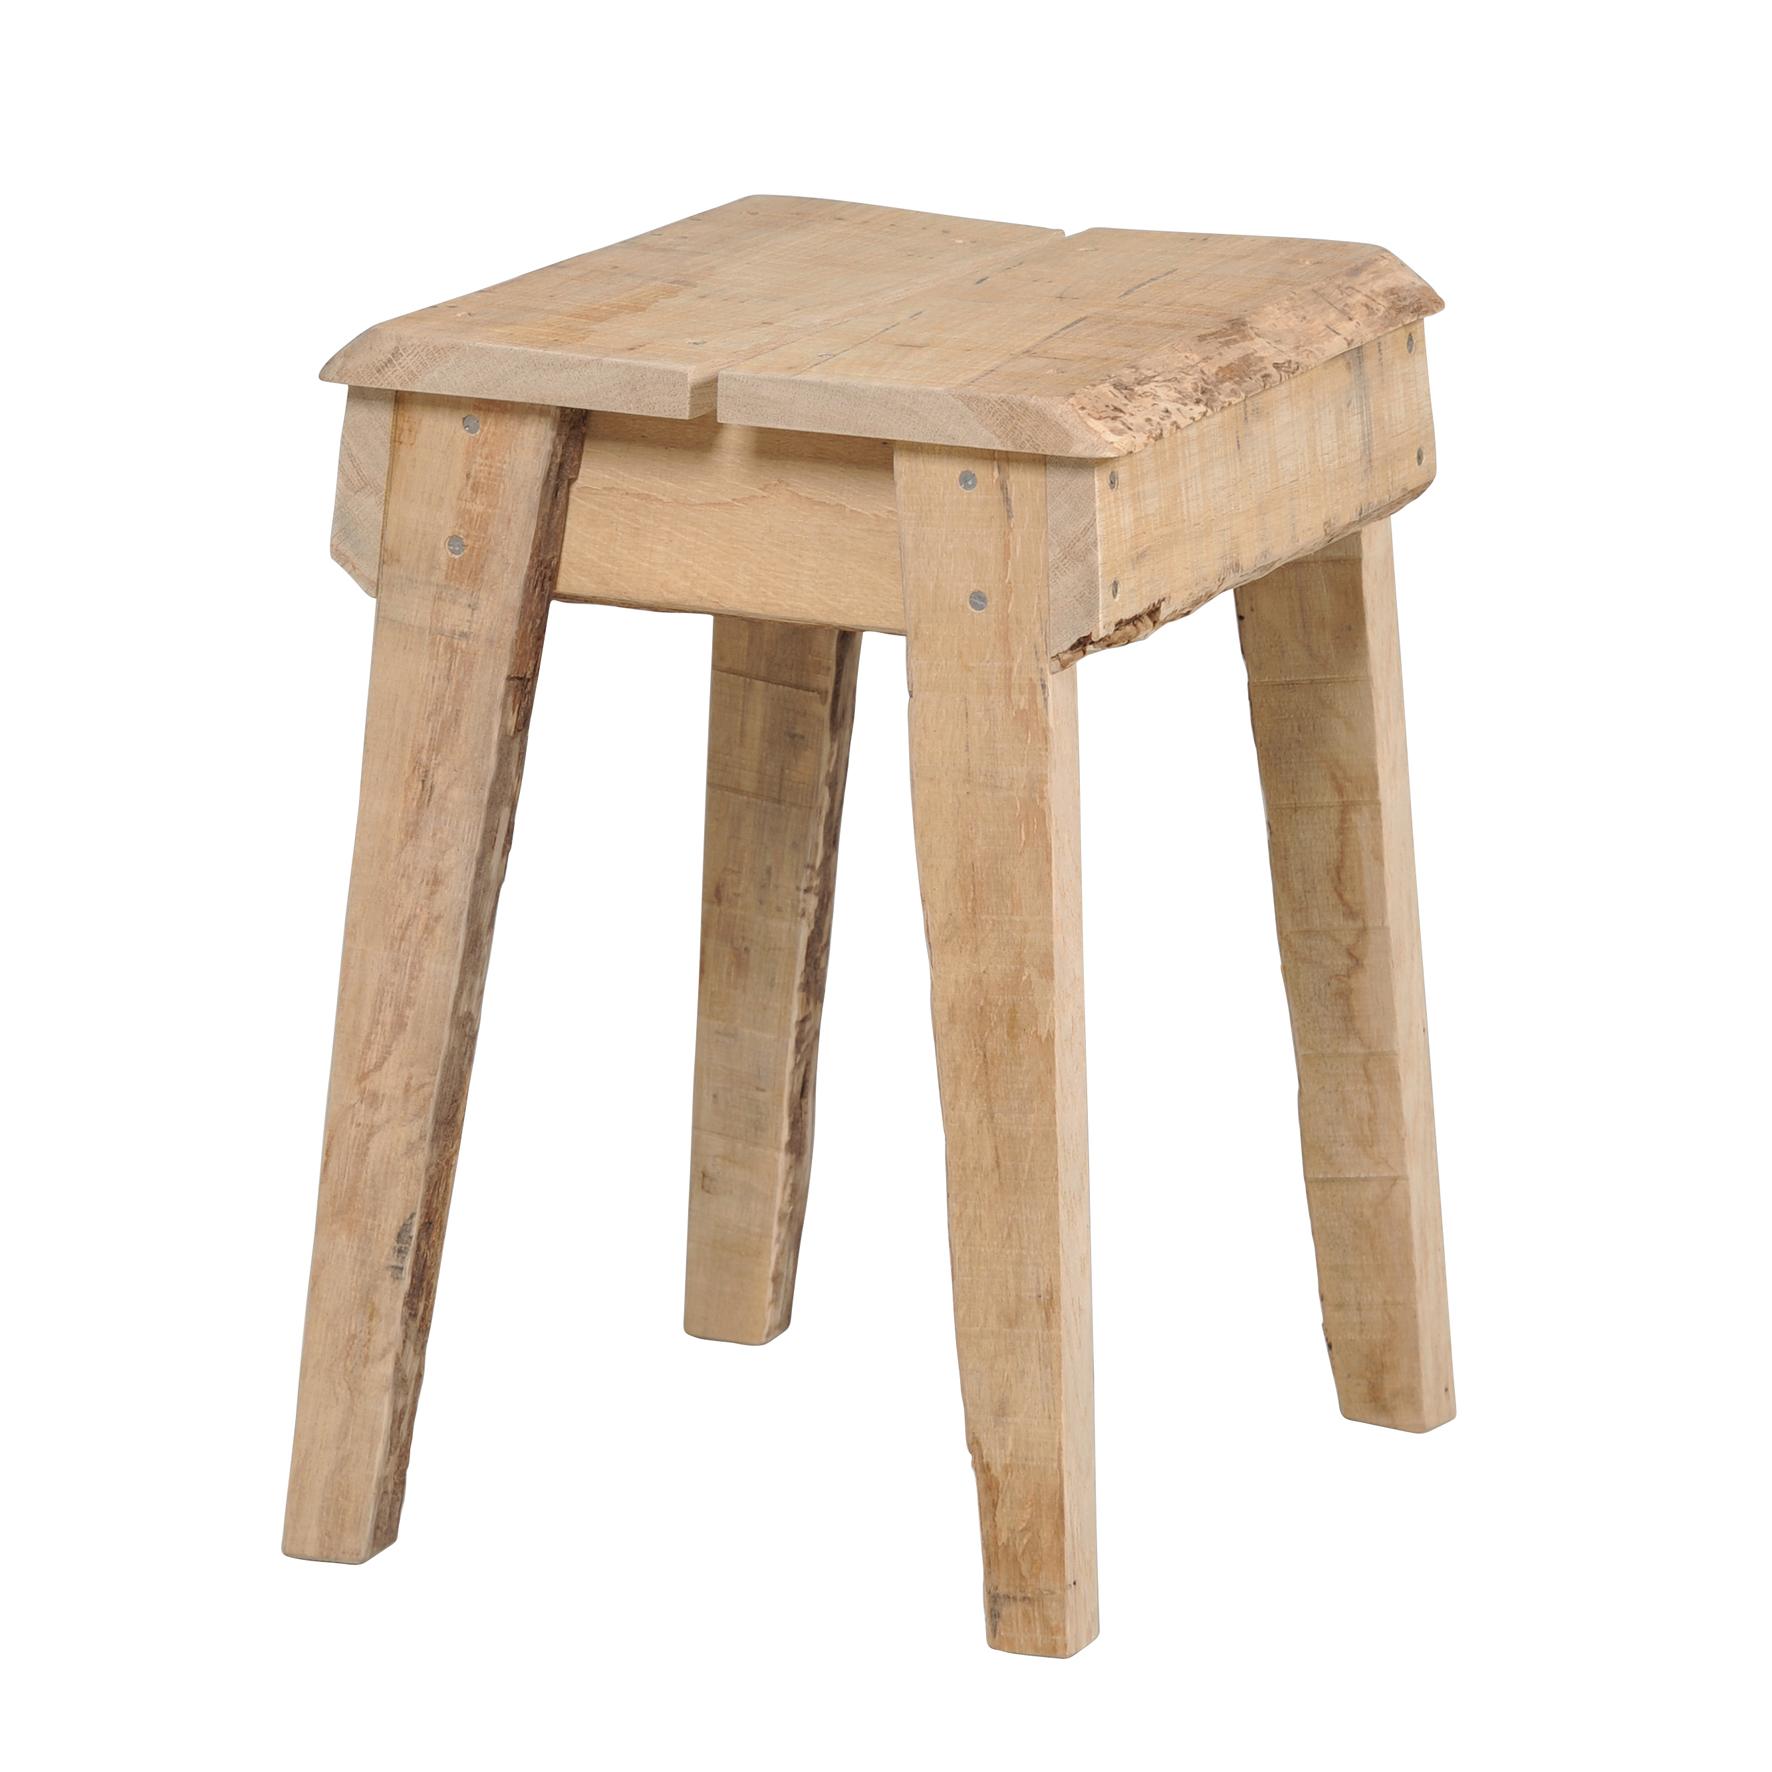 Fonkelnieuw New tree trunk stool • PIET HEIN EEK MF-96